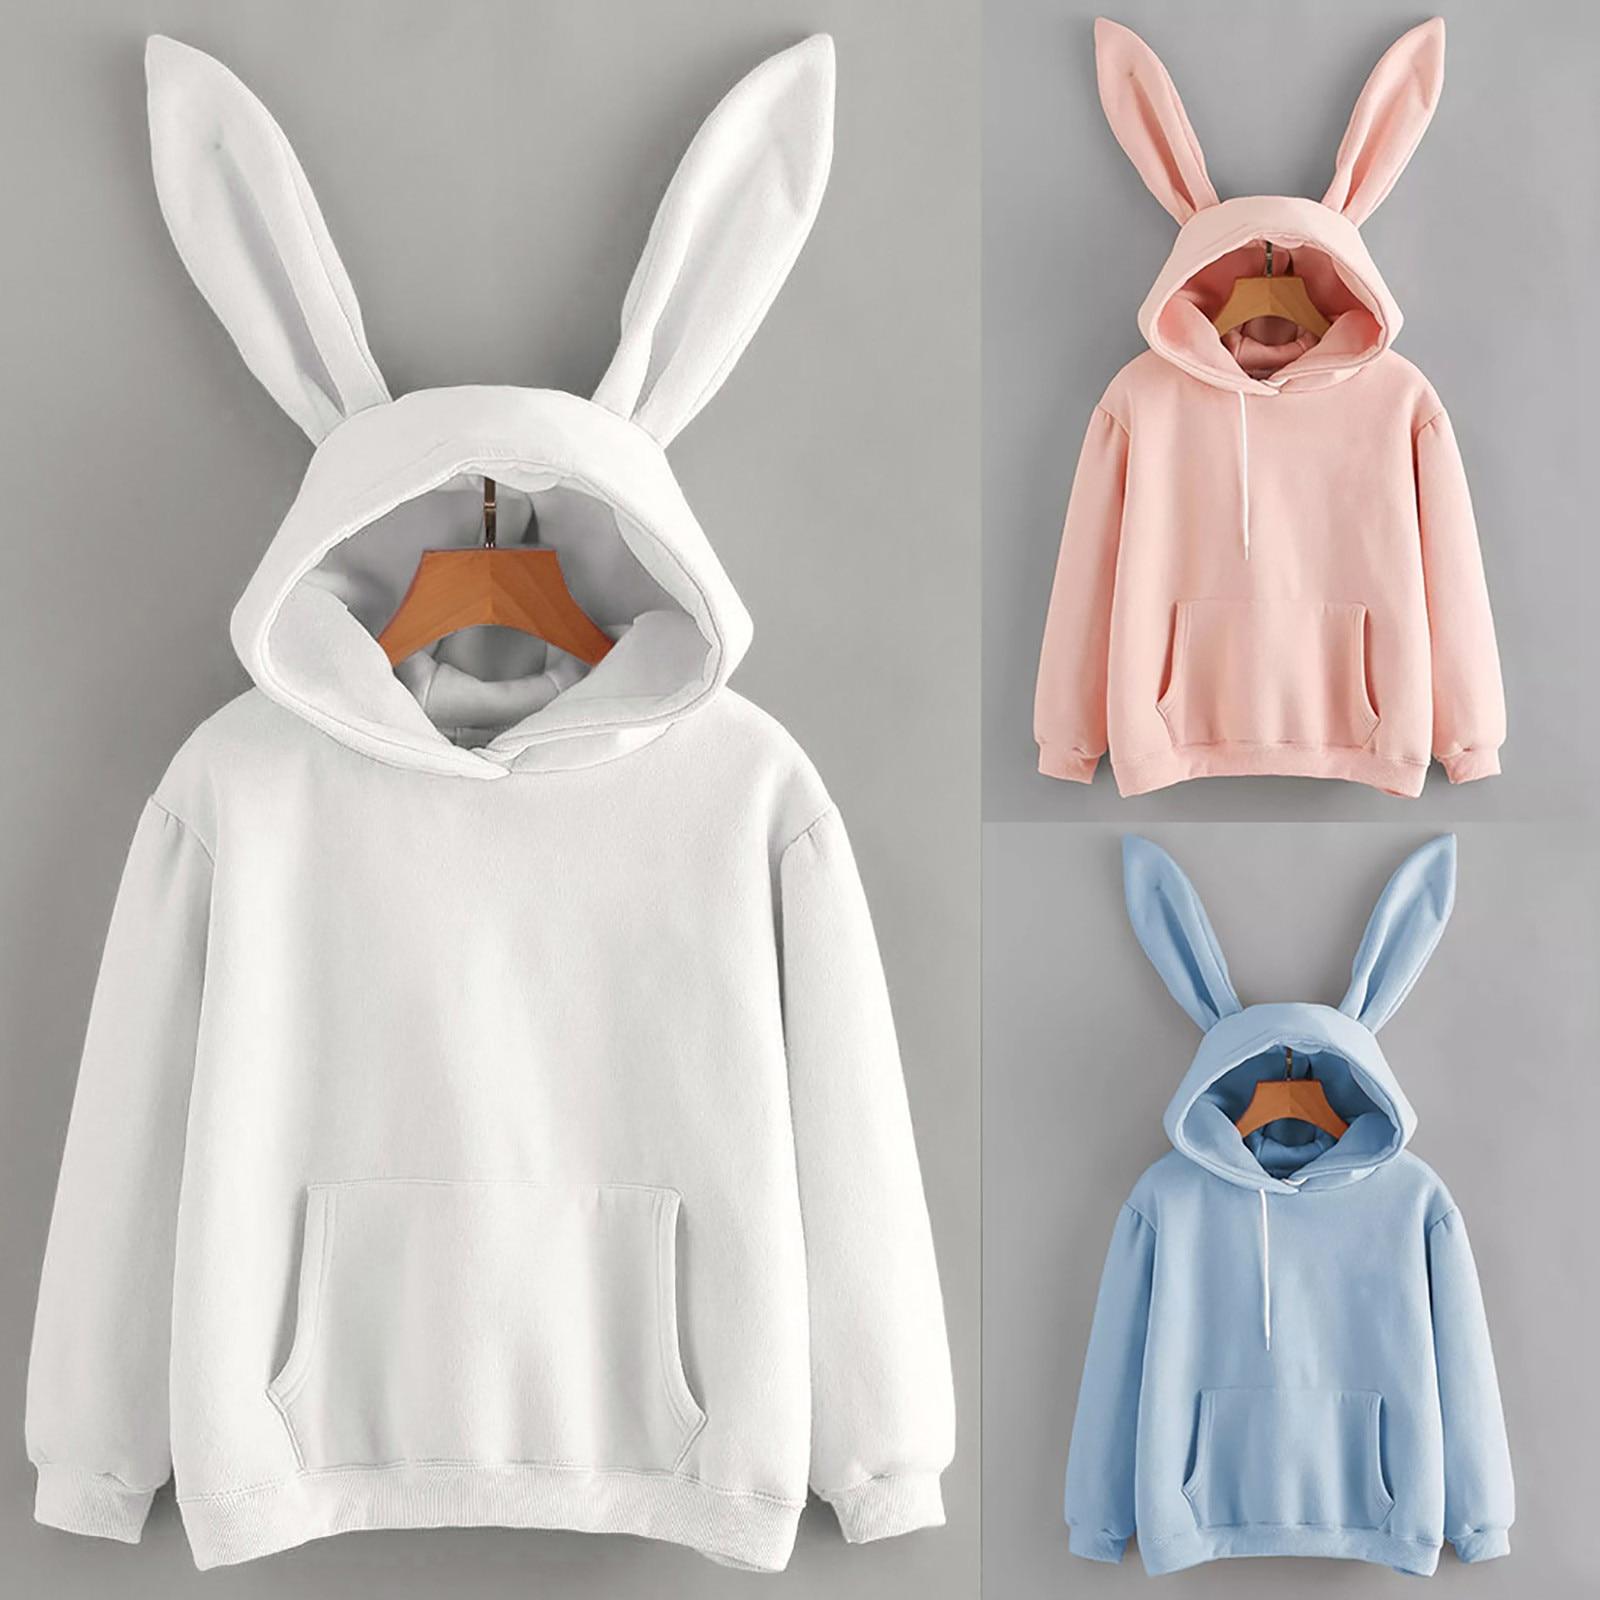 Kawaii hoodies feminino menina moletom 2021 bonito coelho orelha pulôver outono inverno casual manga longa senhoras topo sudadera mujer Agasalhos e Moletons    -